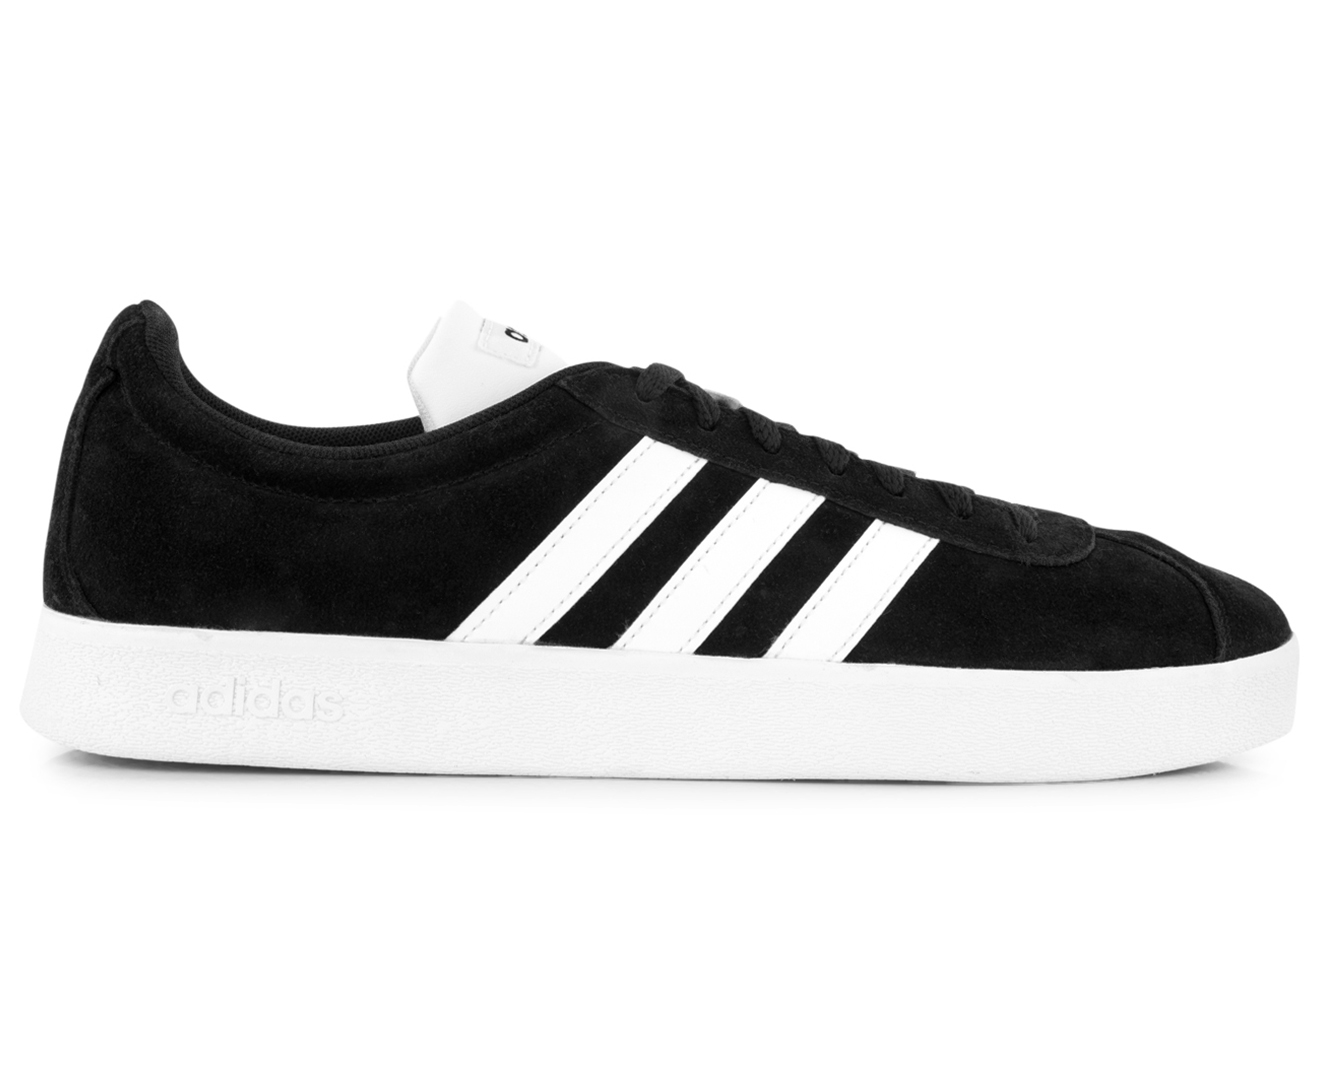 Adidas Men's VL Court 2.0 Sneakers Core BlackWhiteWhite